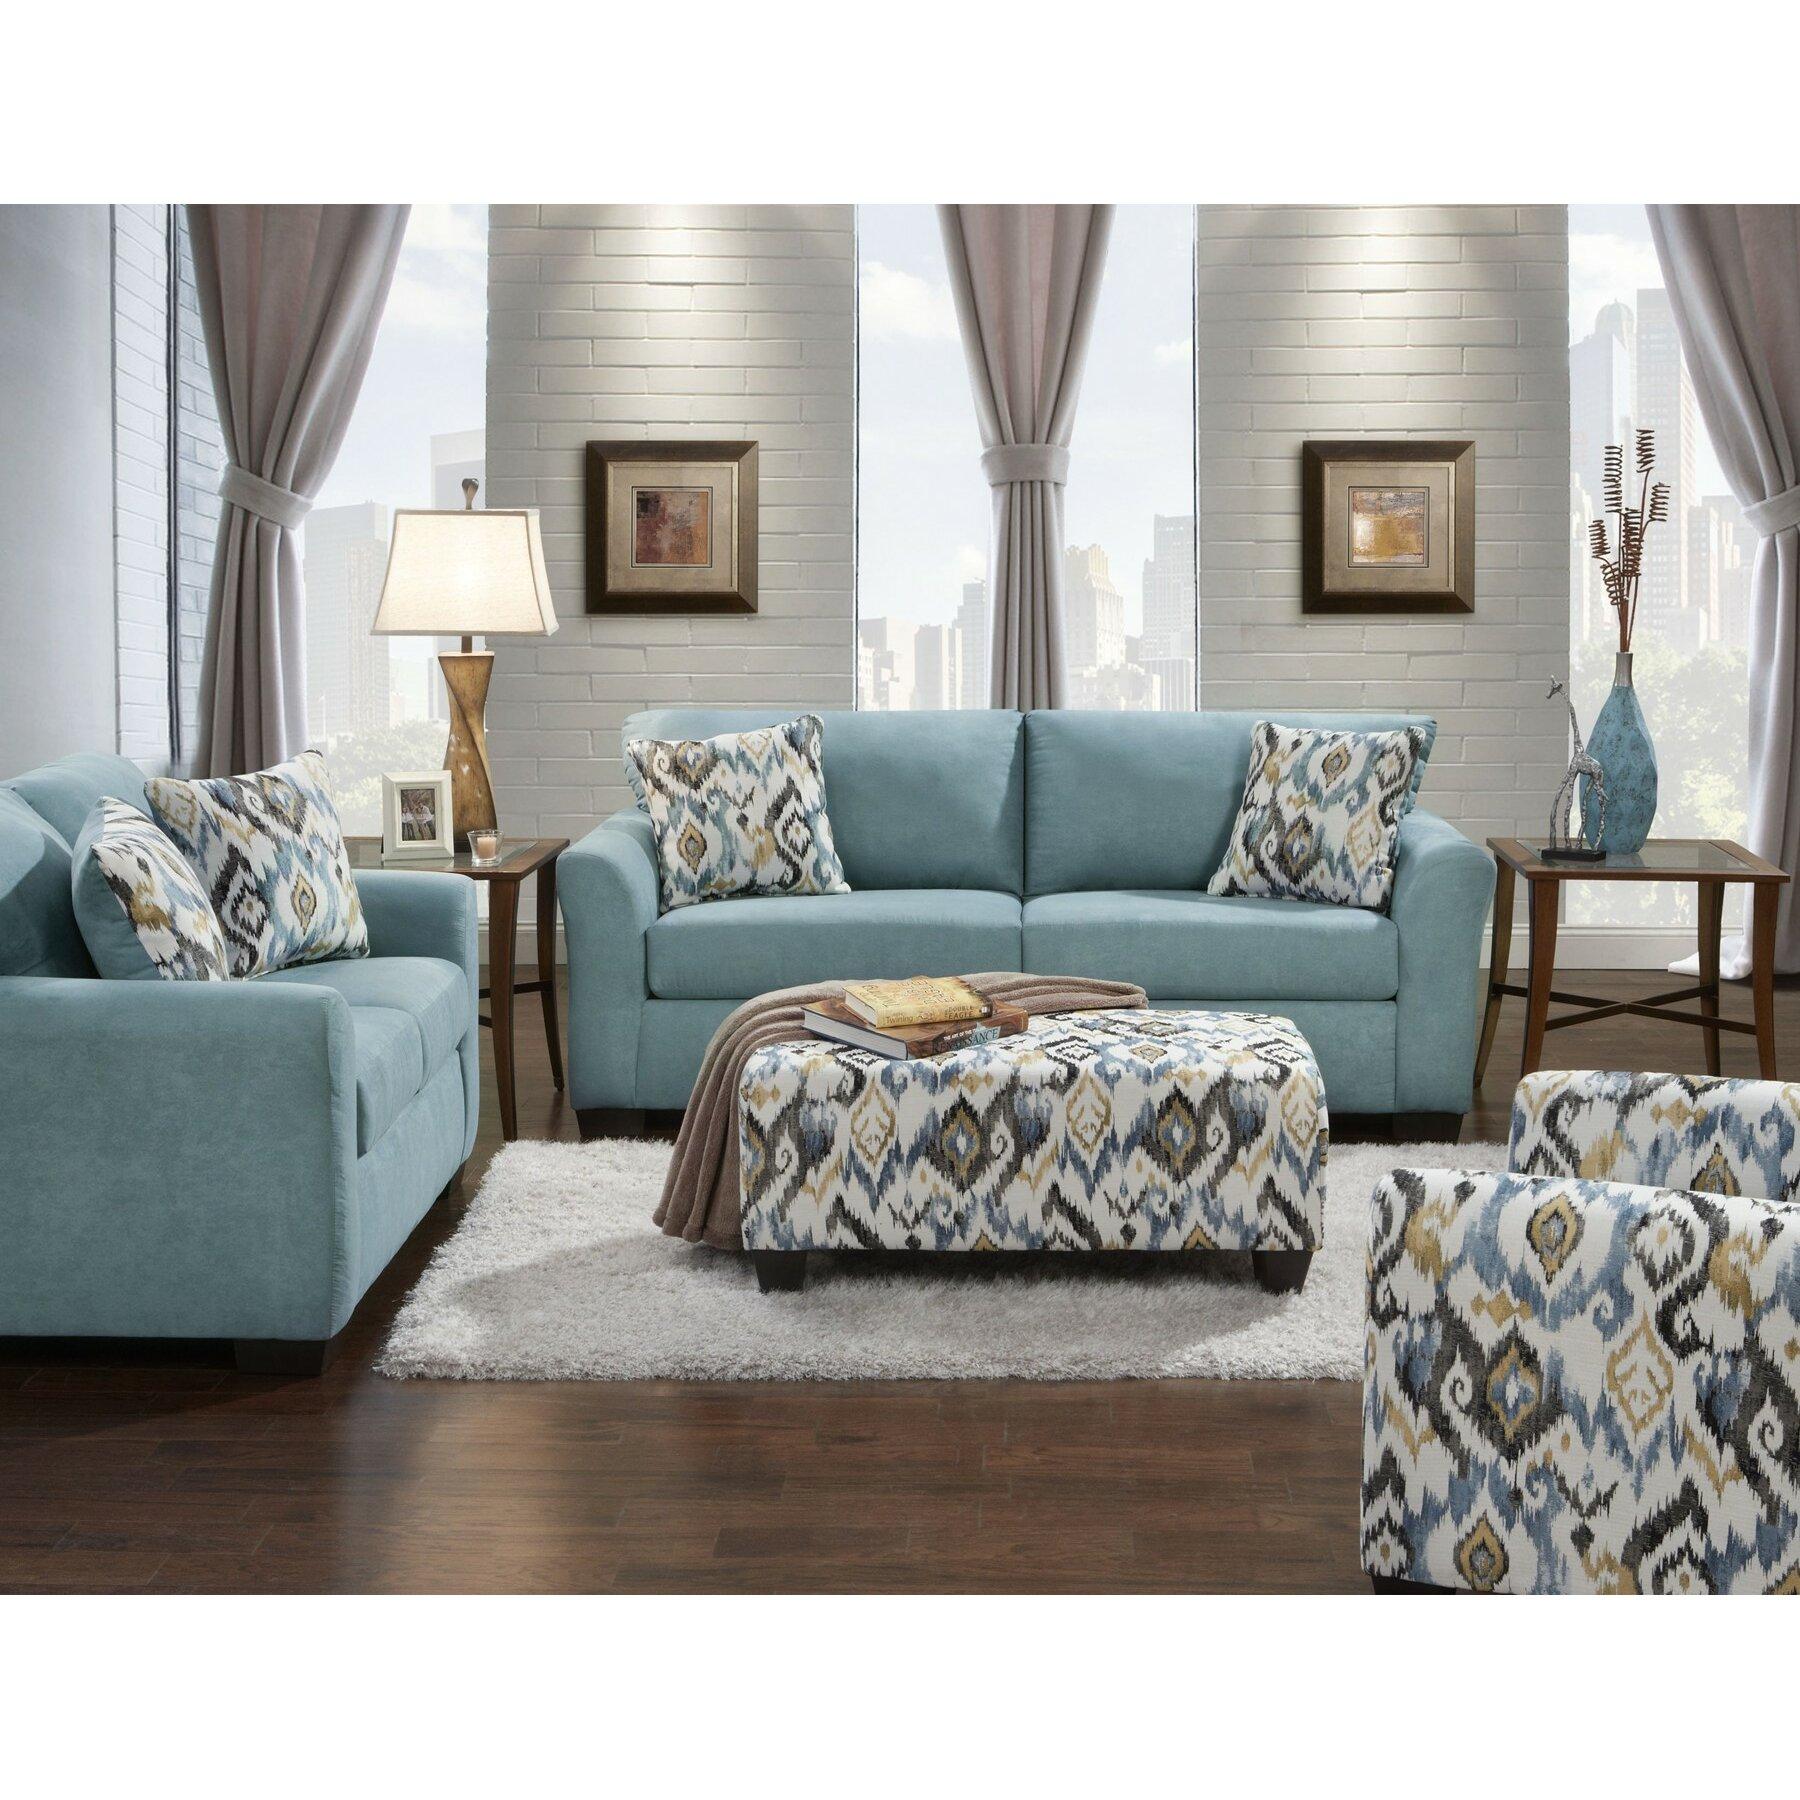 3 piece living room set | Roselawnlutheran